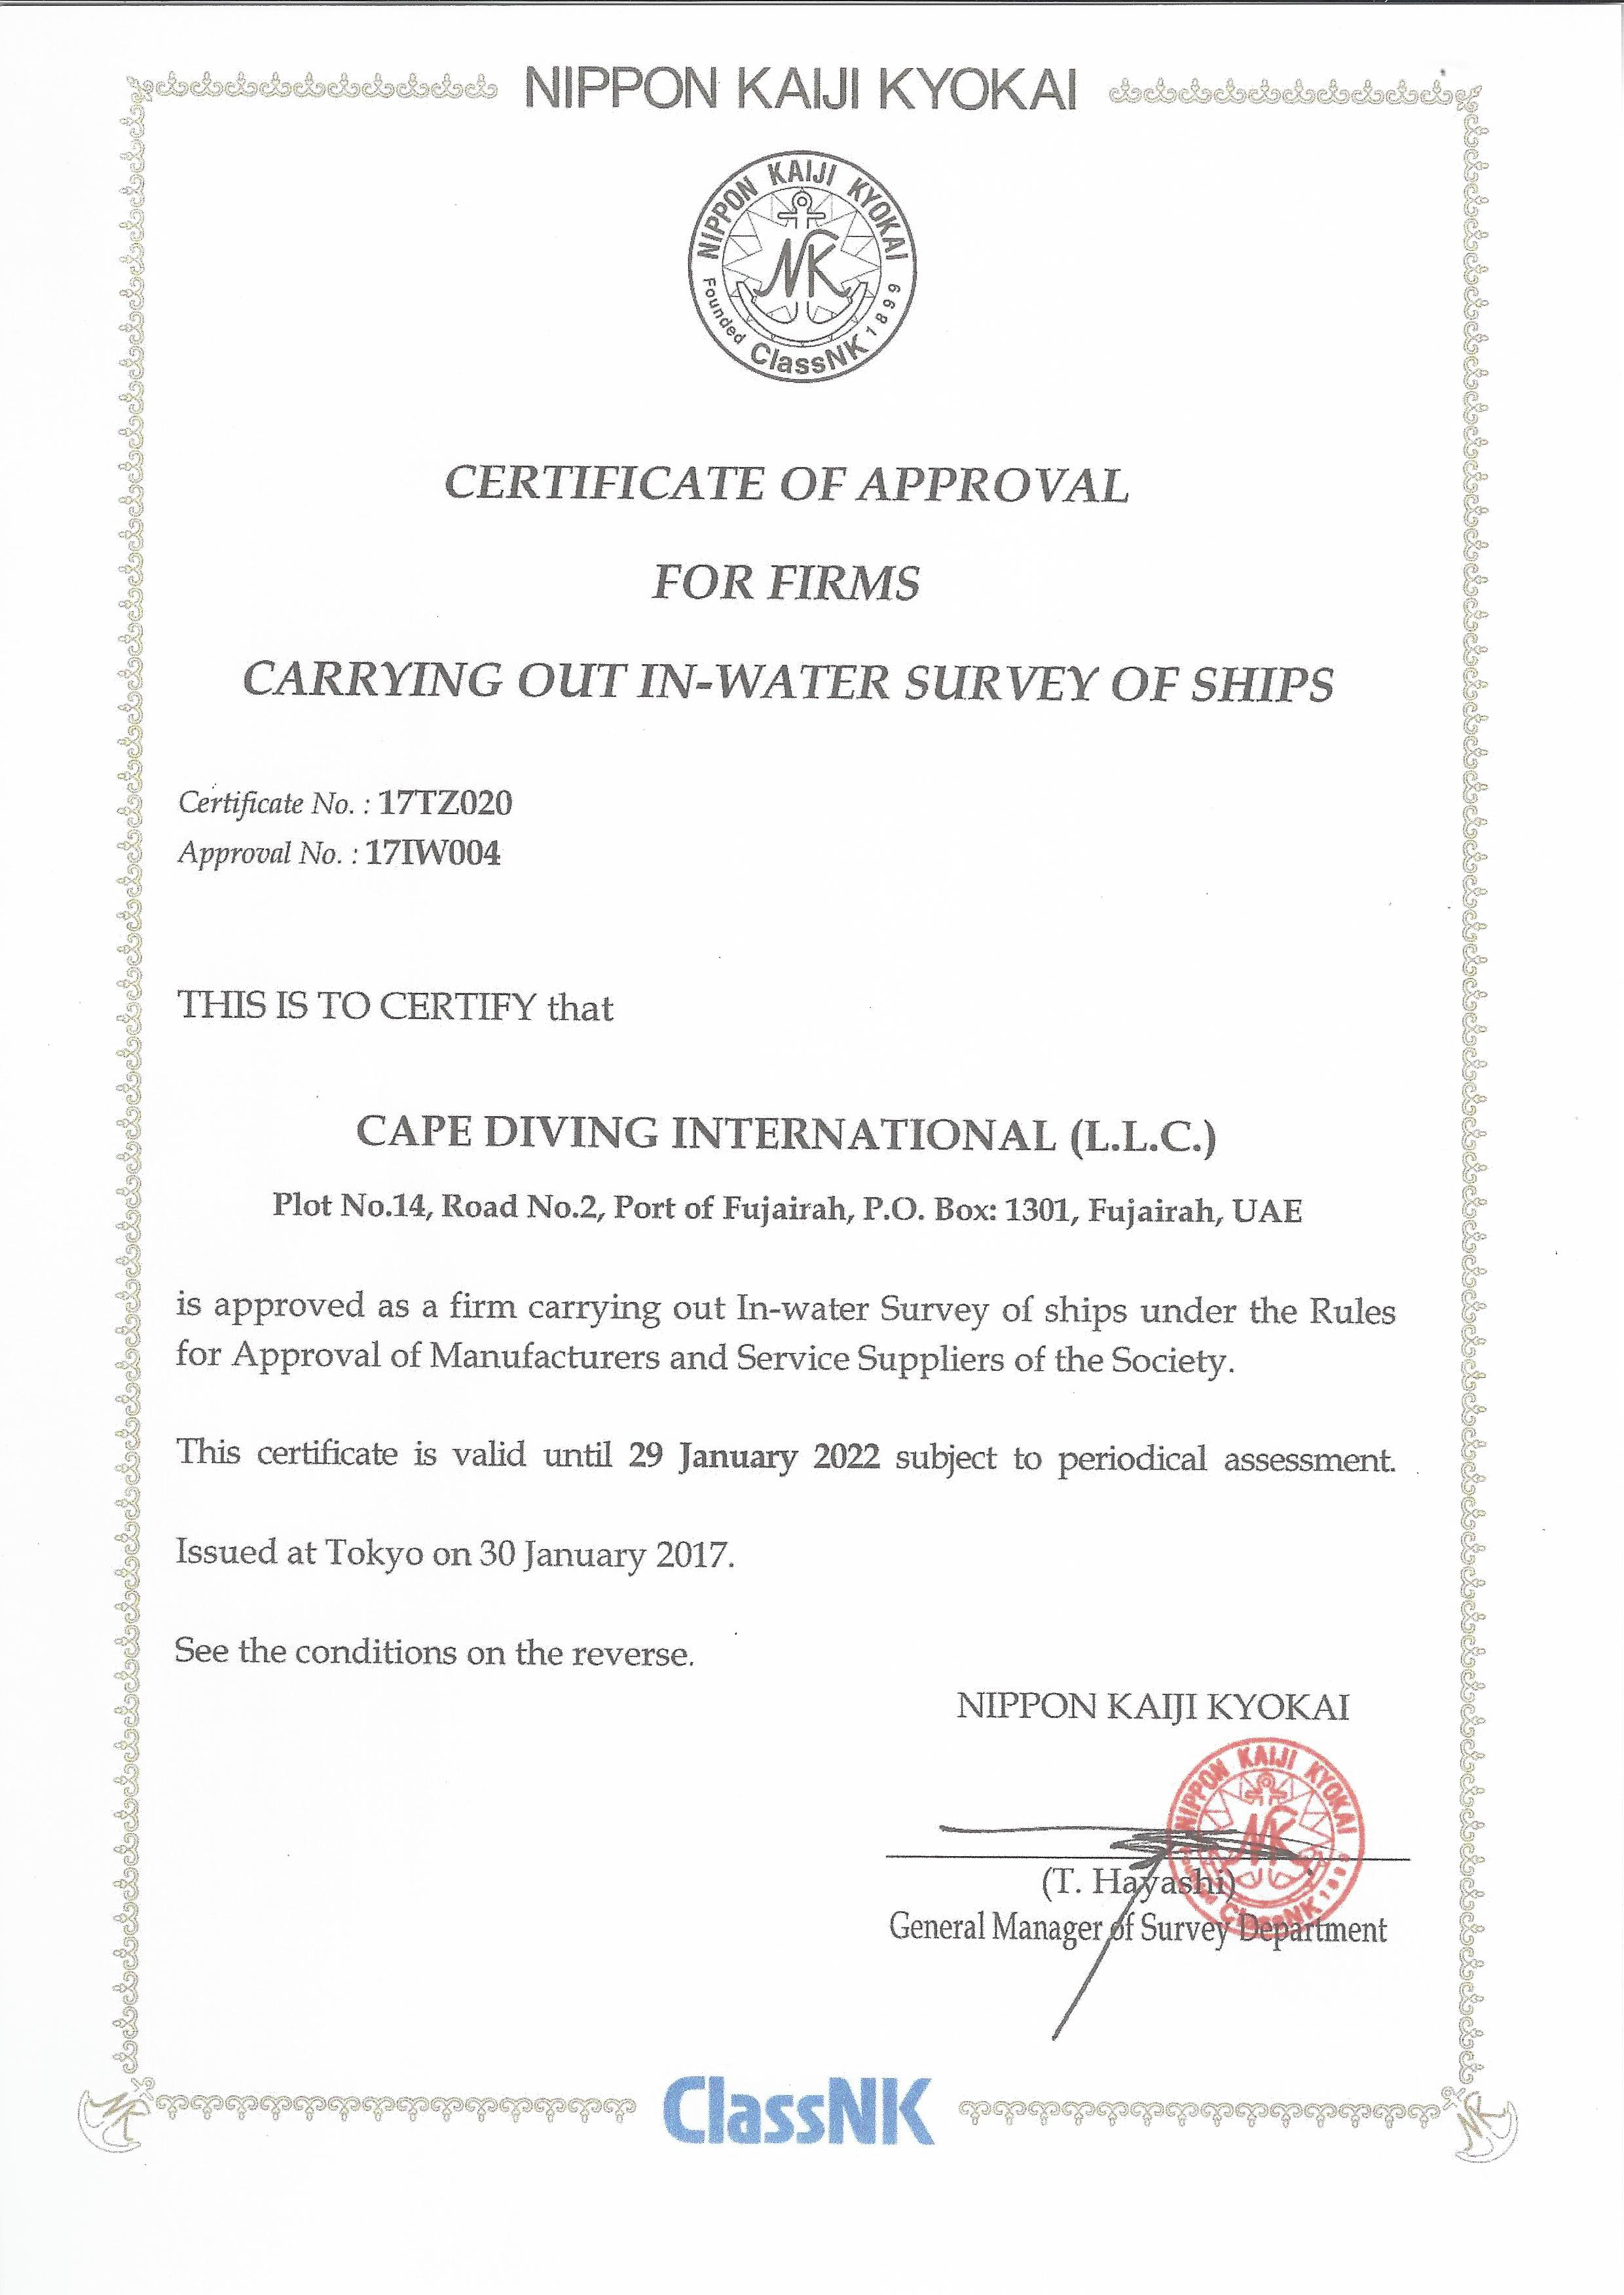 NKK Certificate.jpg